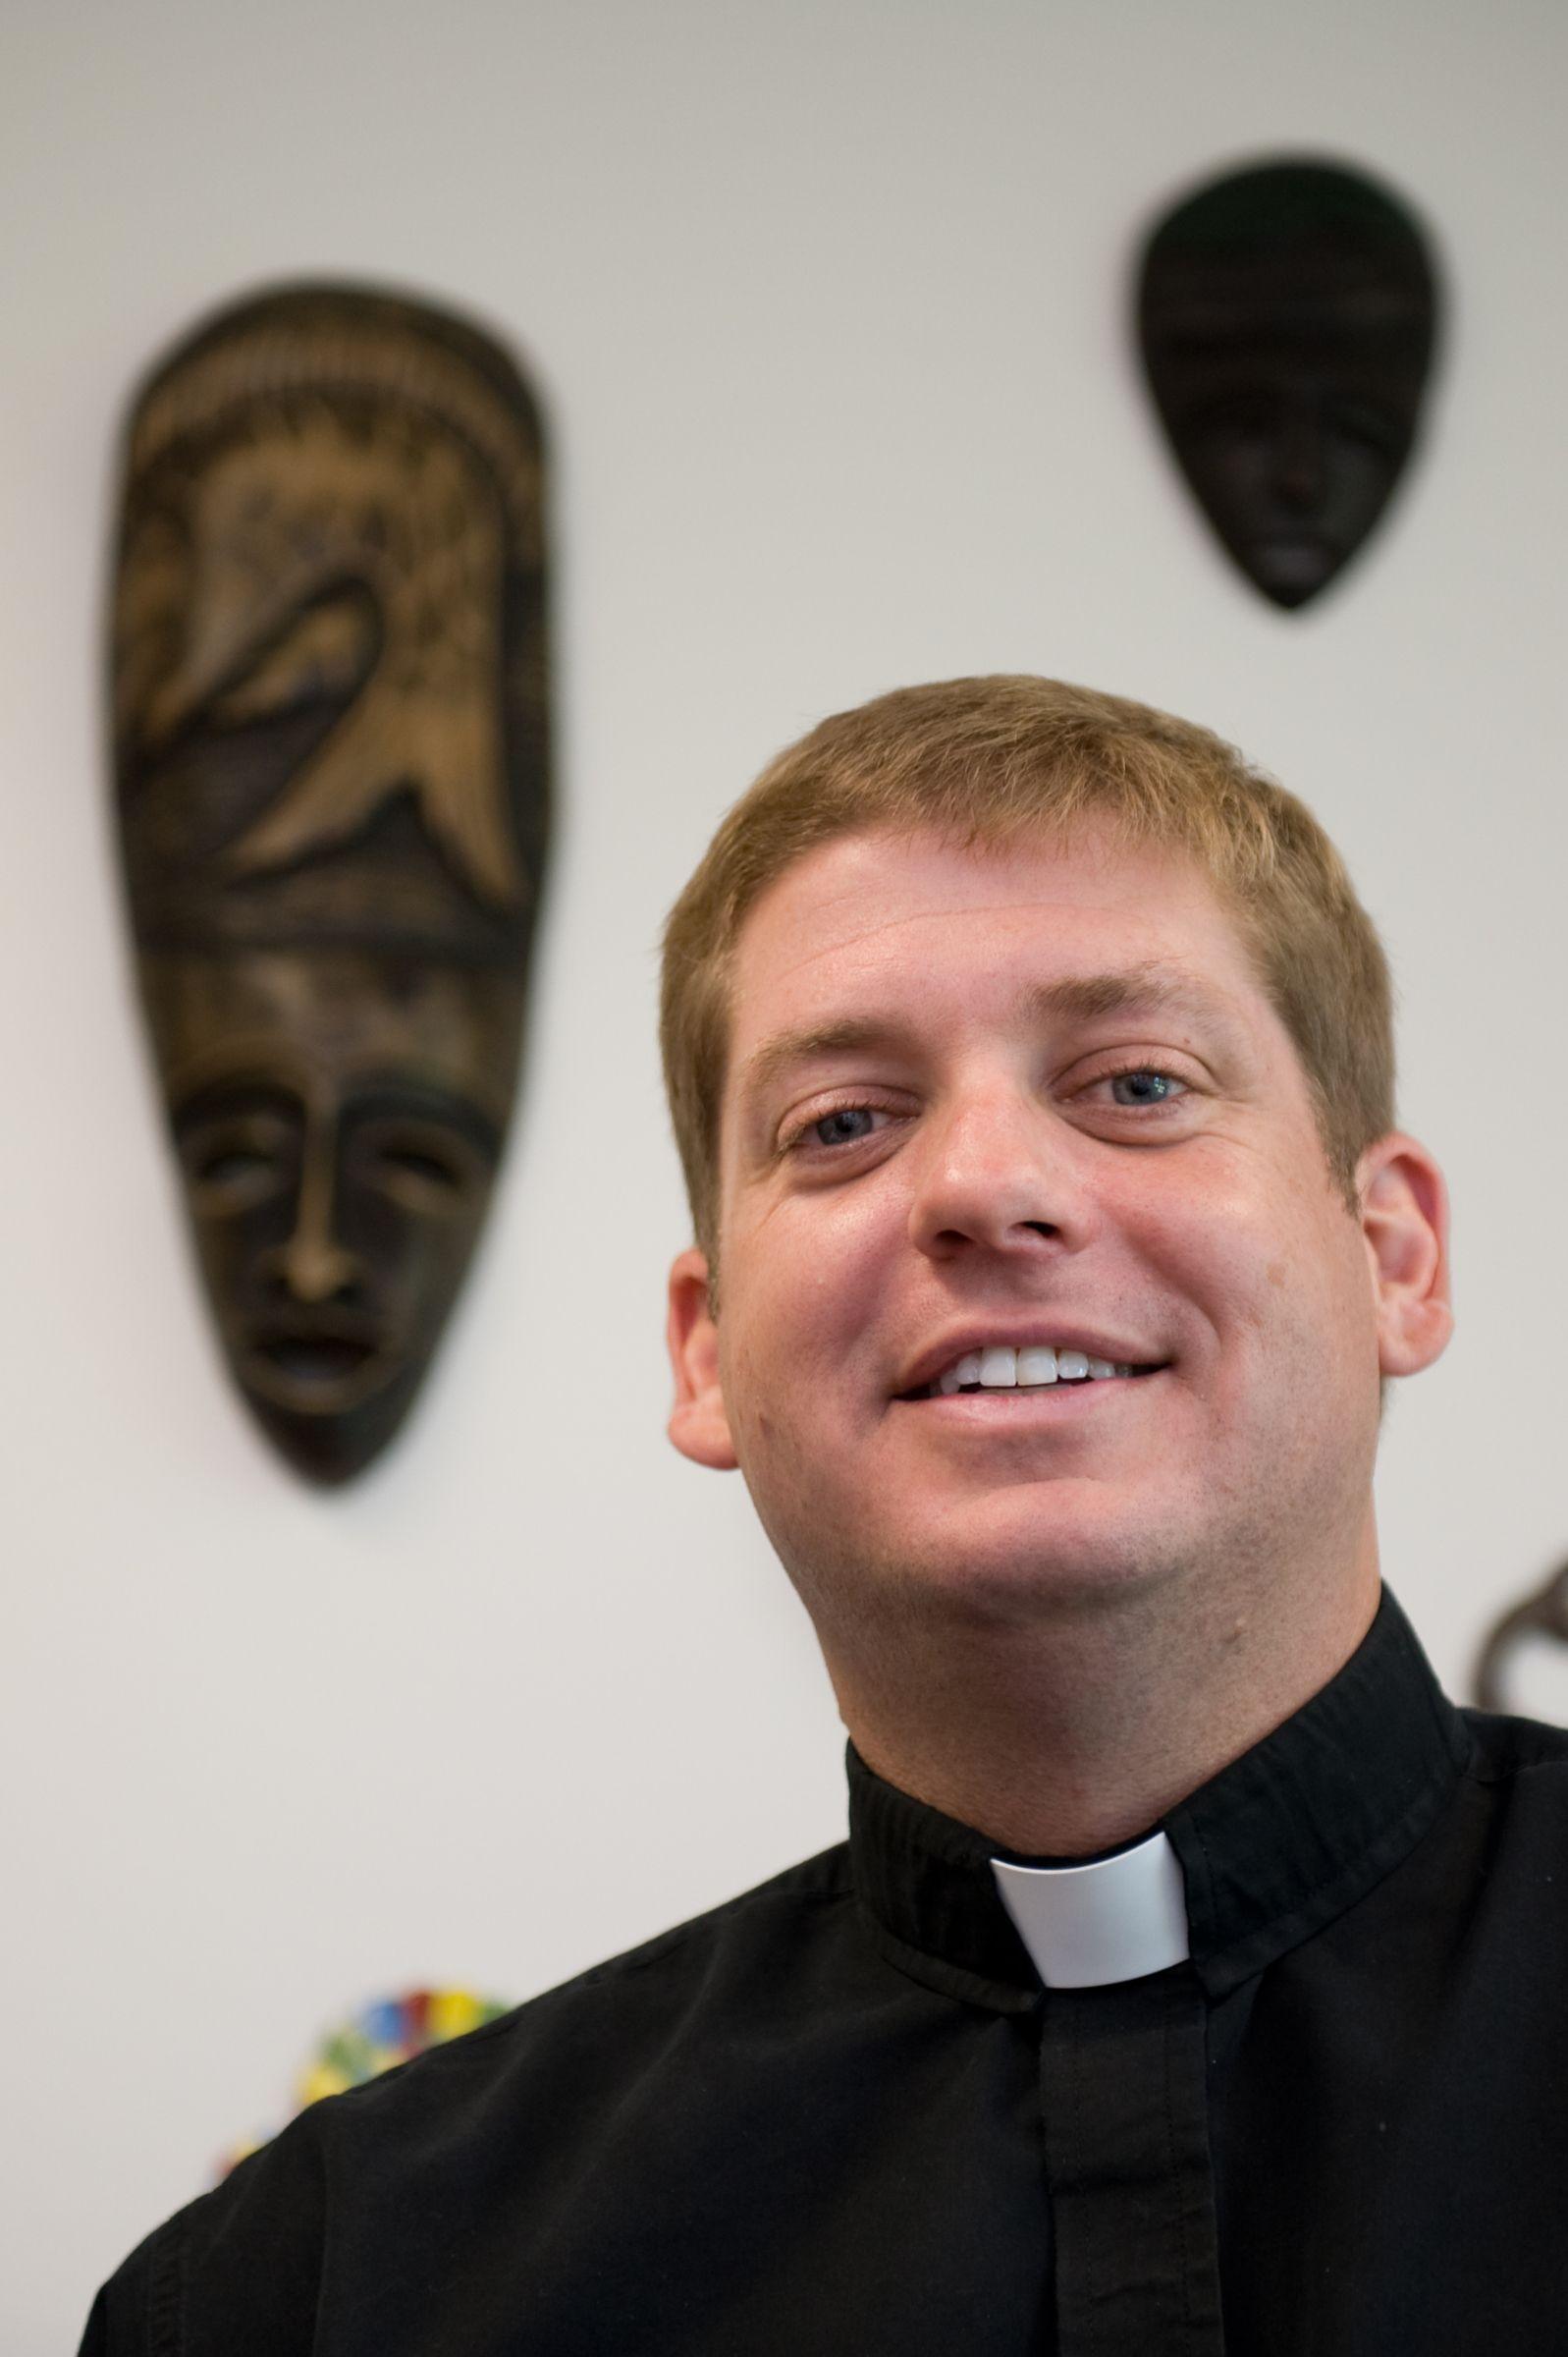 Open Day 23 of Gonzaga's Advent calendar to hear Rev. C. Hightower, S ...